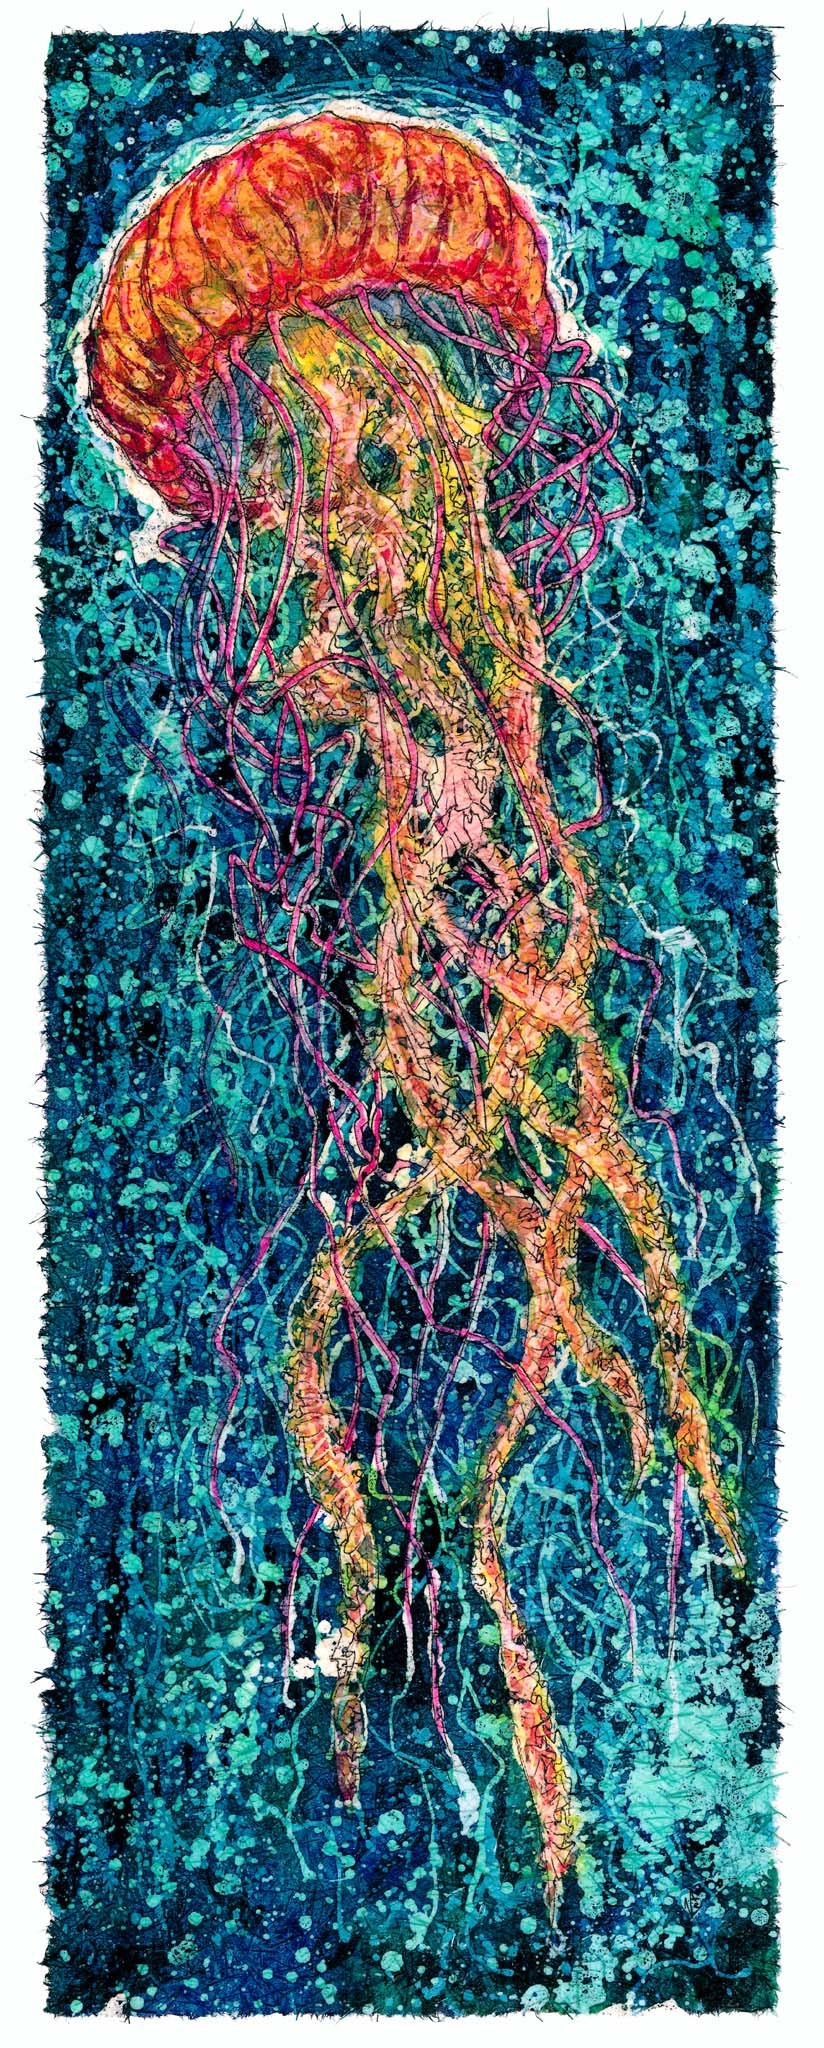 Small Nettle RGB.jpg